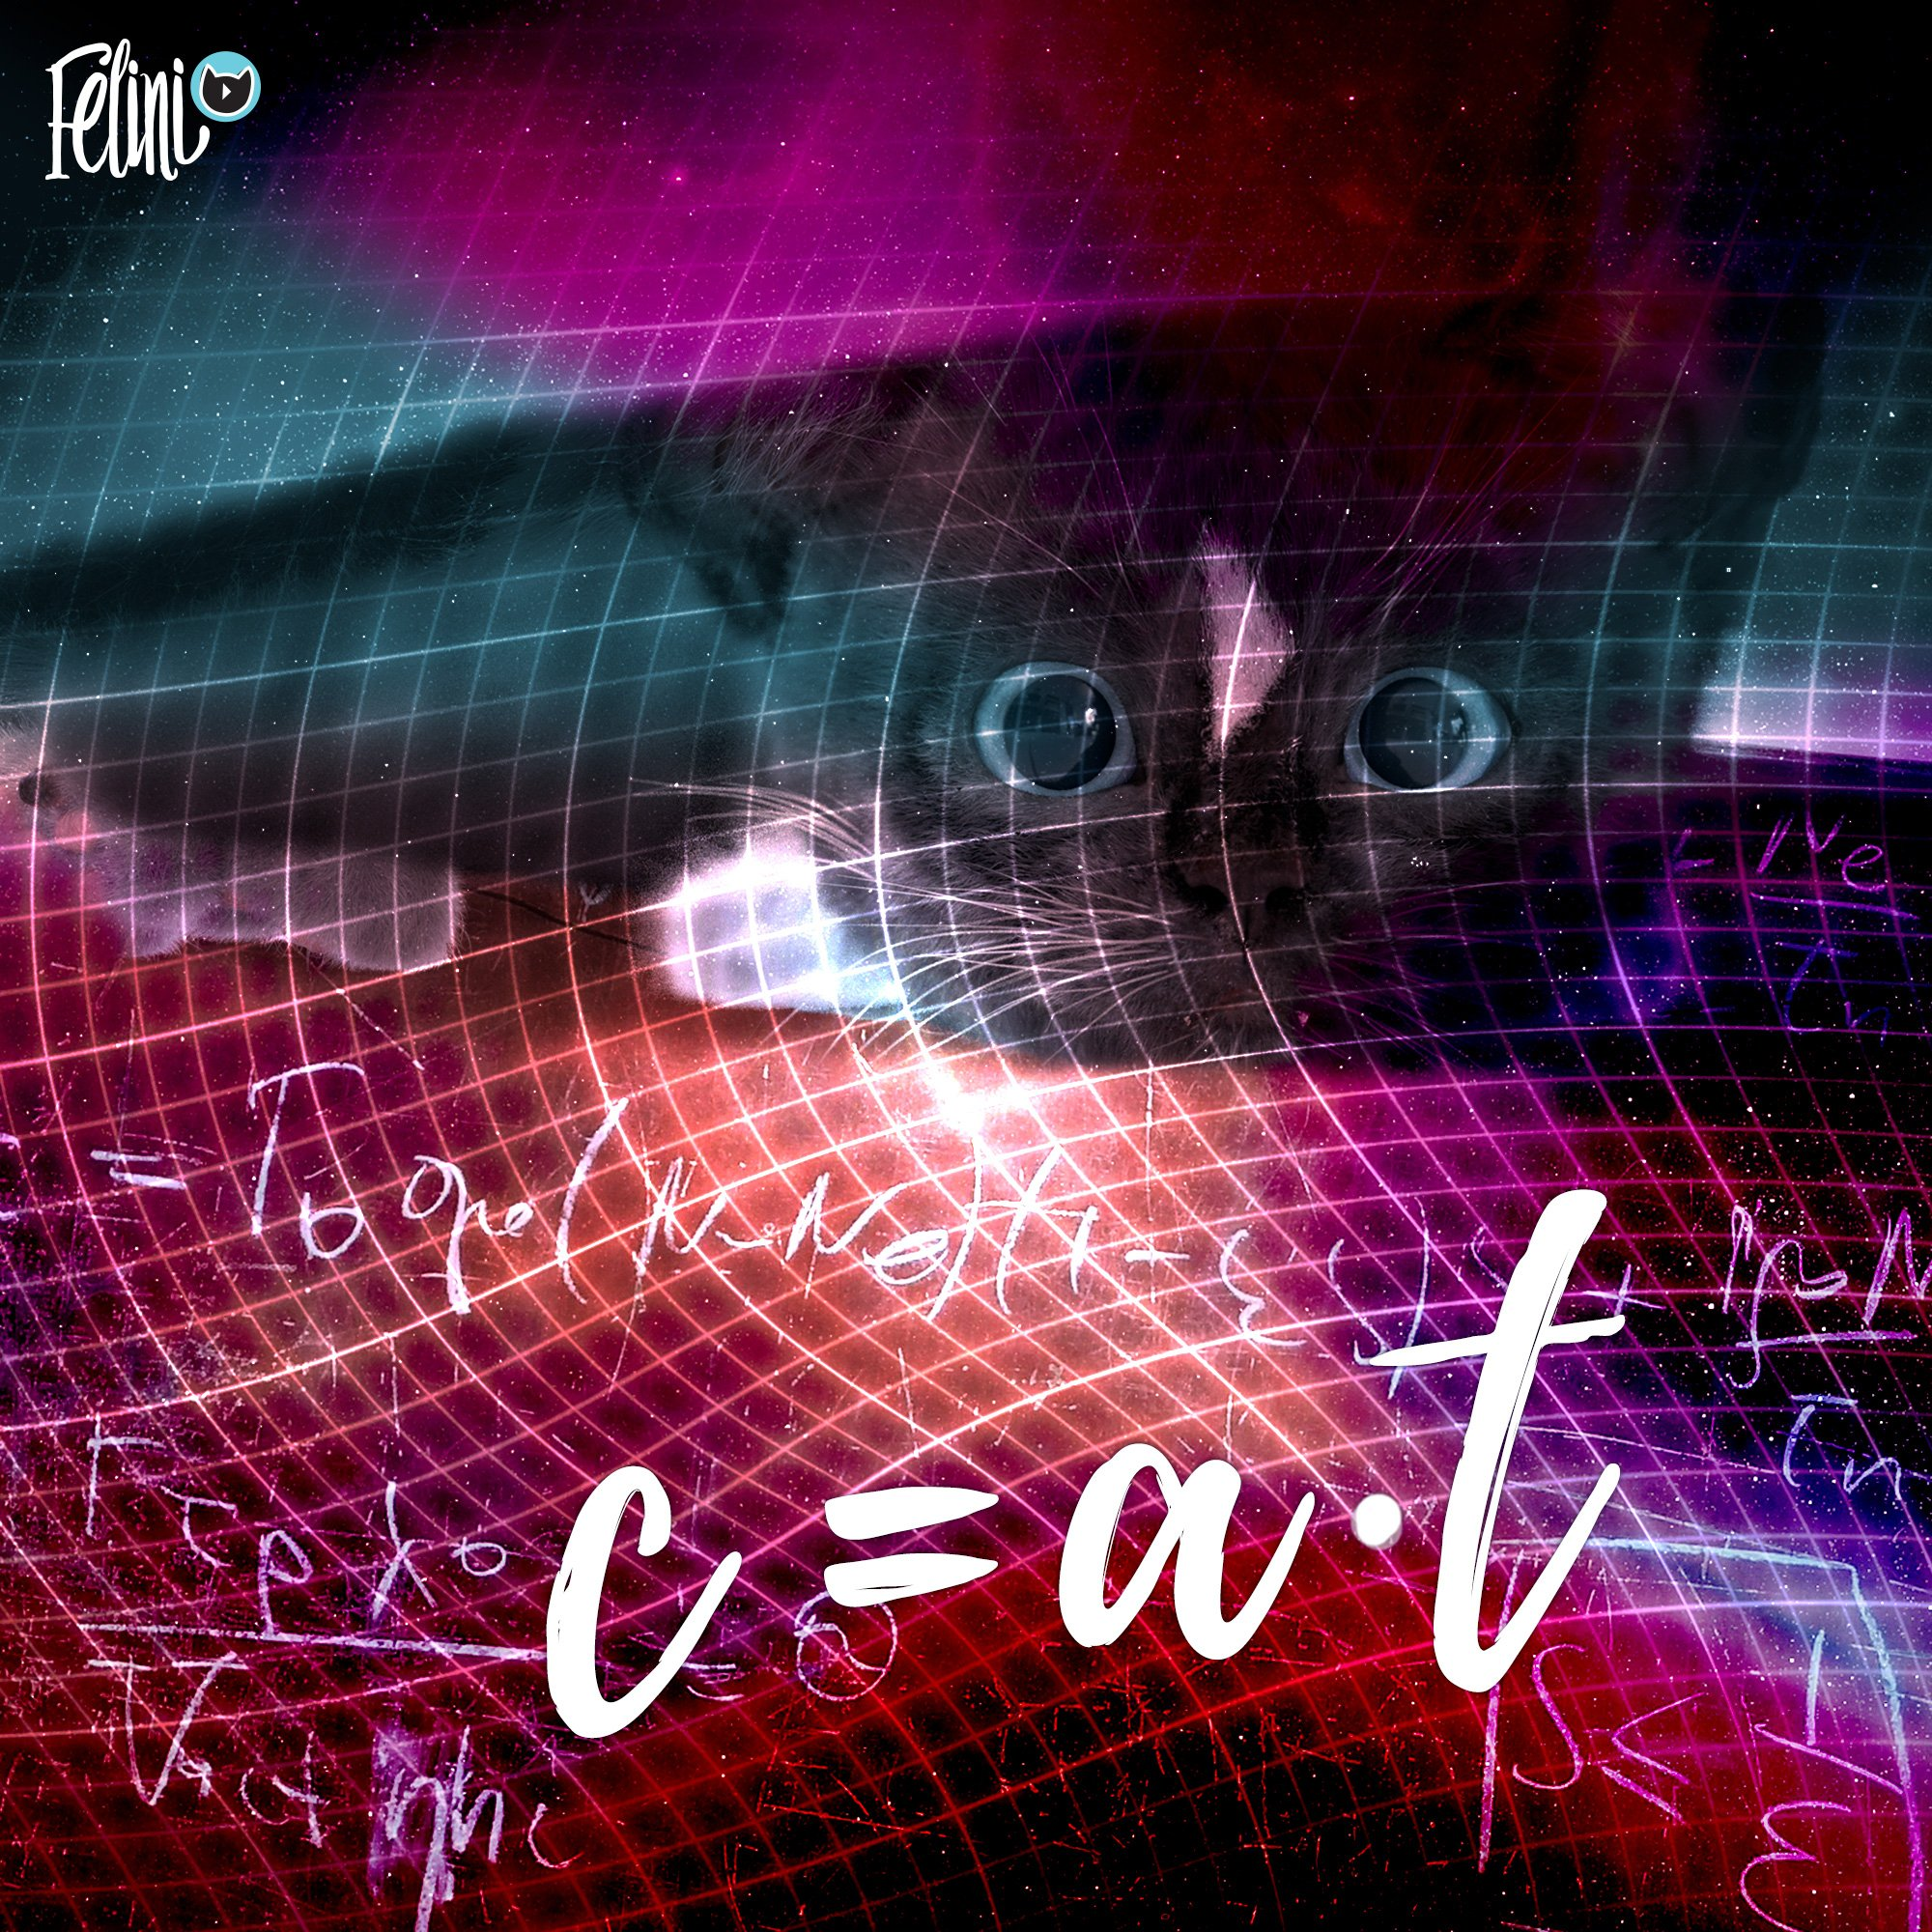 Felini introduces the cat formula